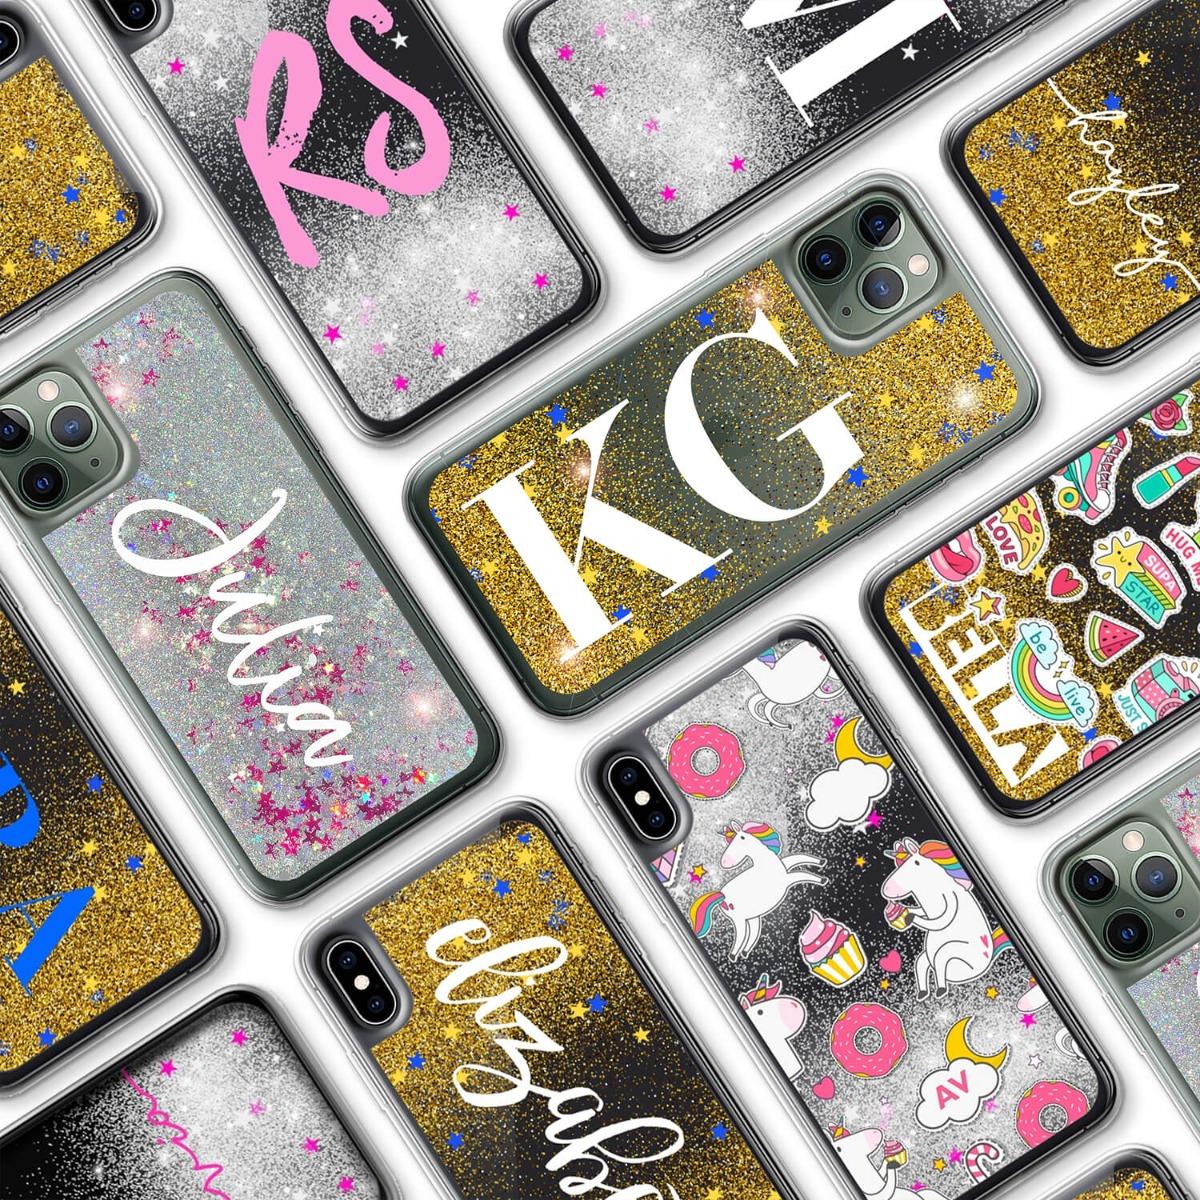 Galaxy S8 Glitter Case 16235